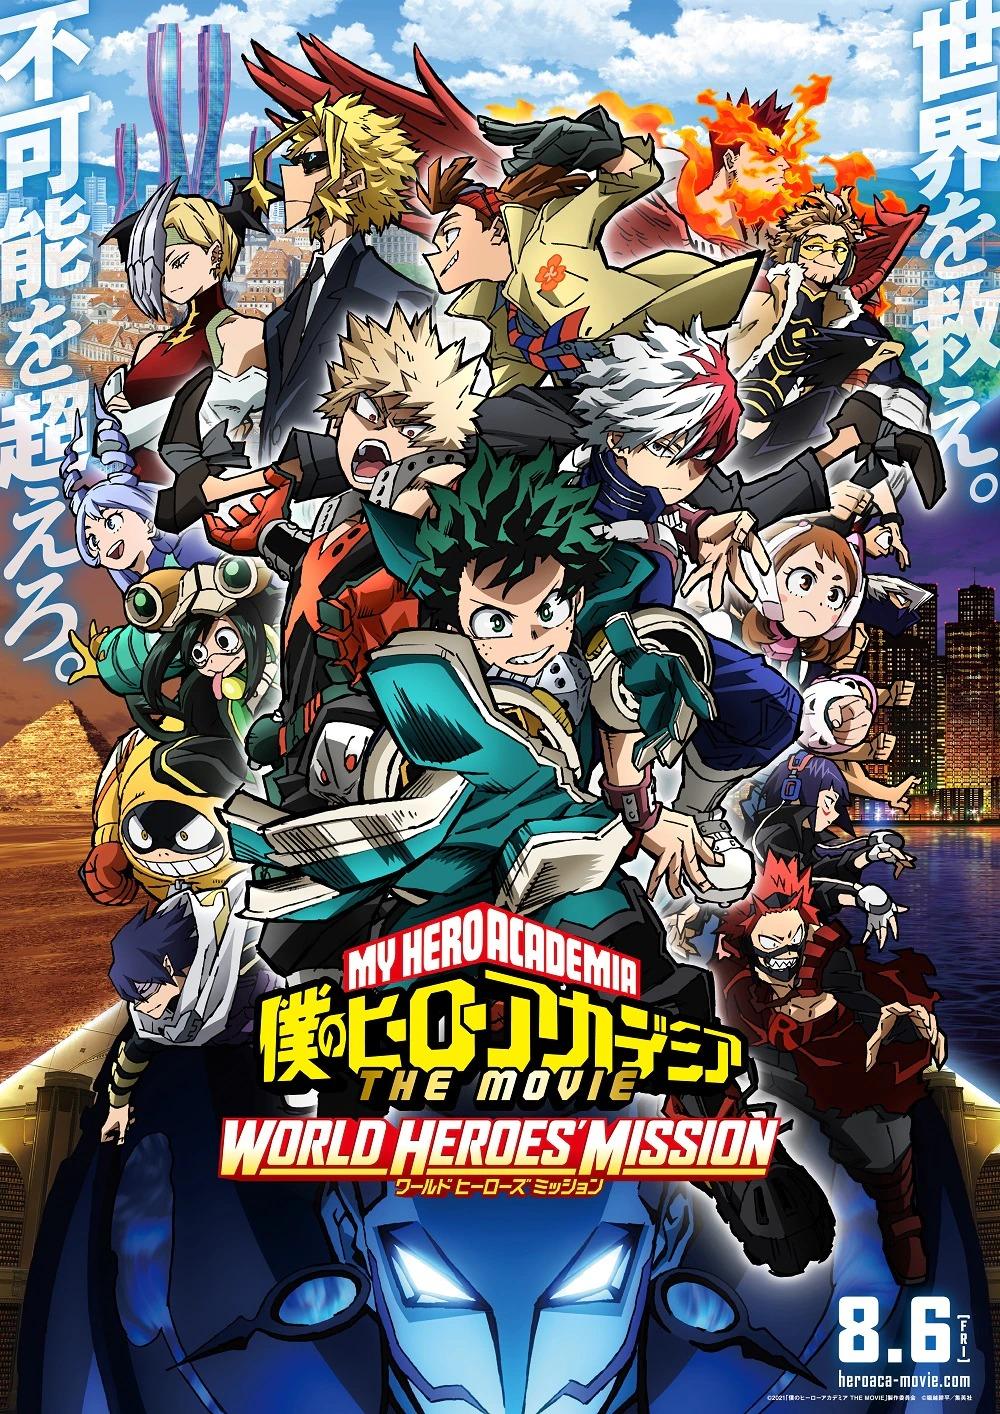 My Hero Academia: World Heroes' Mission llega a Latinoamérica